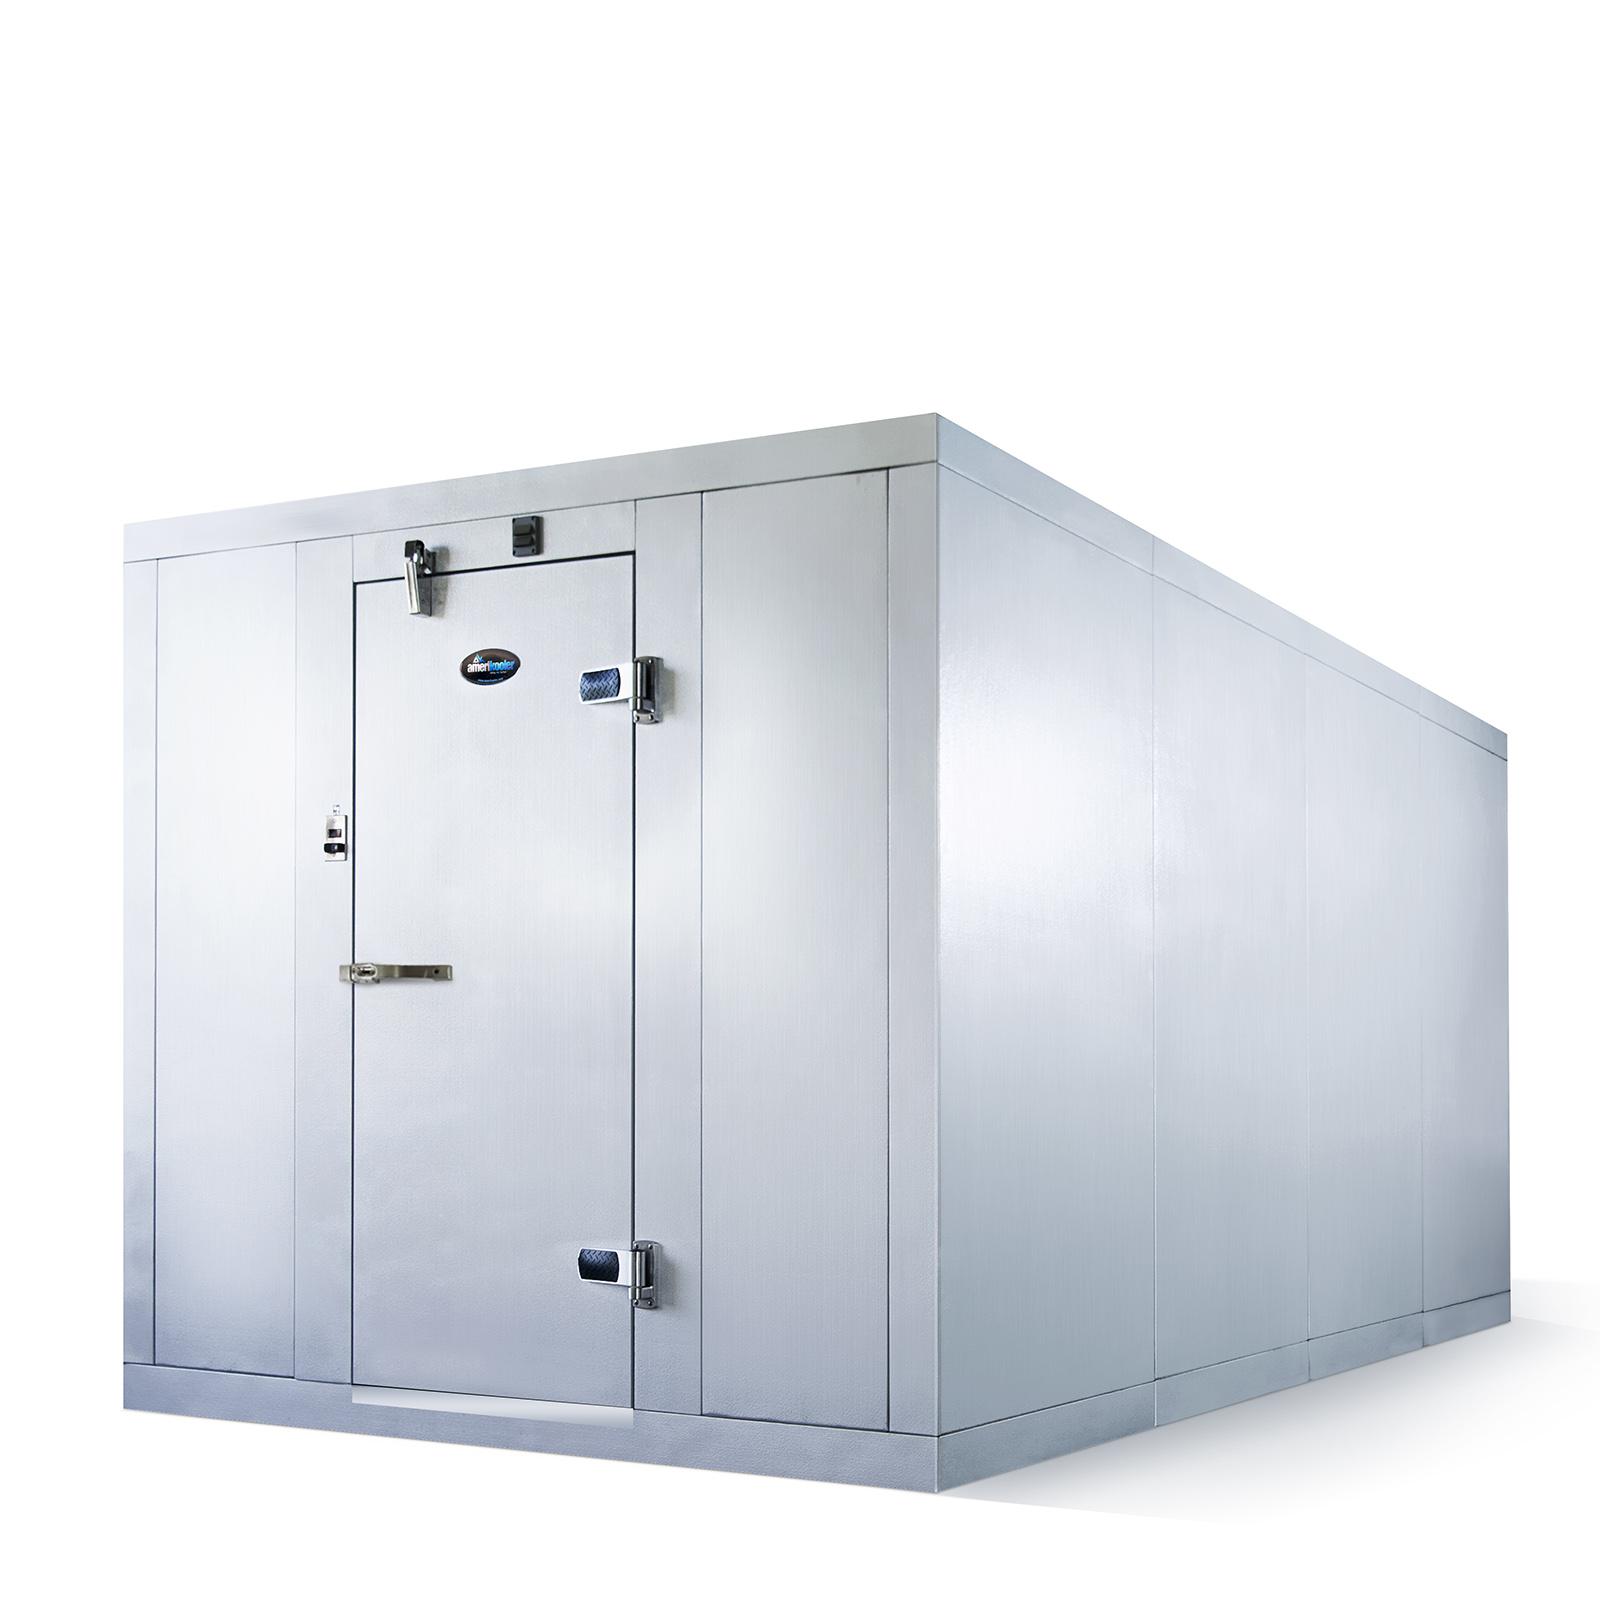 AmeriKooler DF061677**FBRF walk in freezer, modular, remote